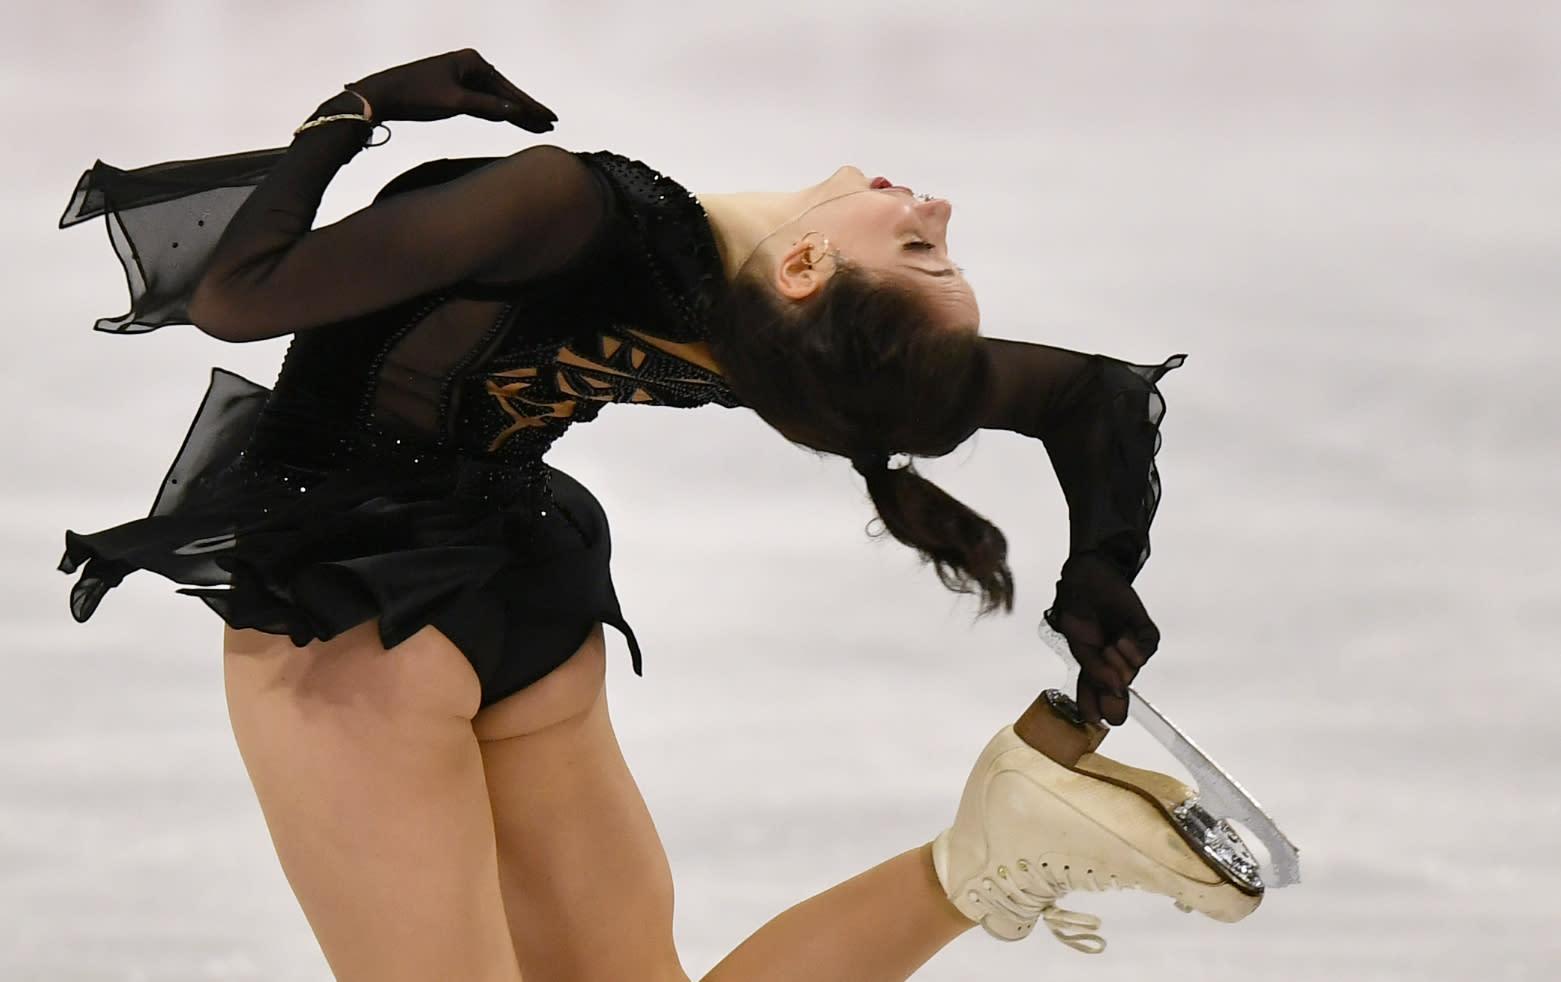 Russian skater Elizaveta Tuktamysheva performs during the Ladies Free Skating at the Figure Skating World Championships in Stockholm, Sweden, Friday, March 26, 2021. (AP Photo/Martin Meissner)